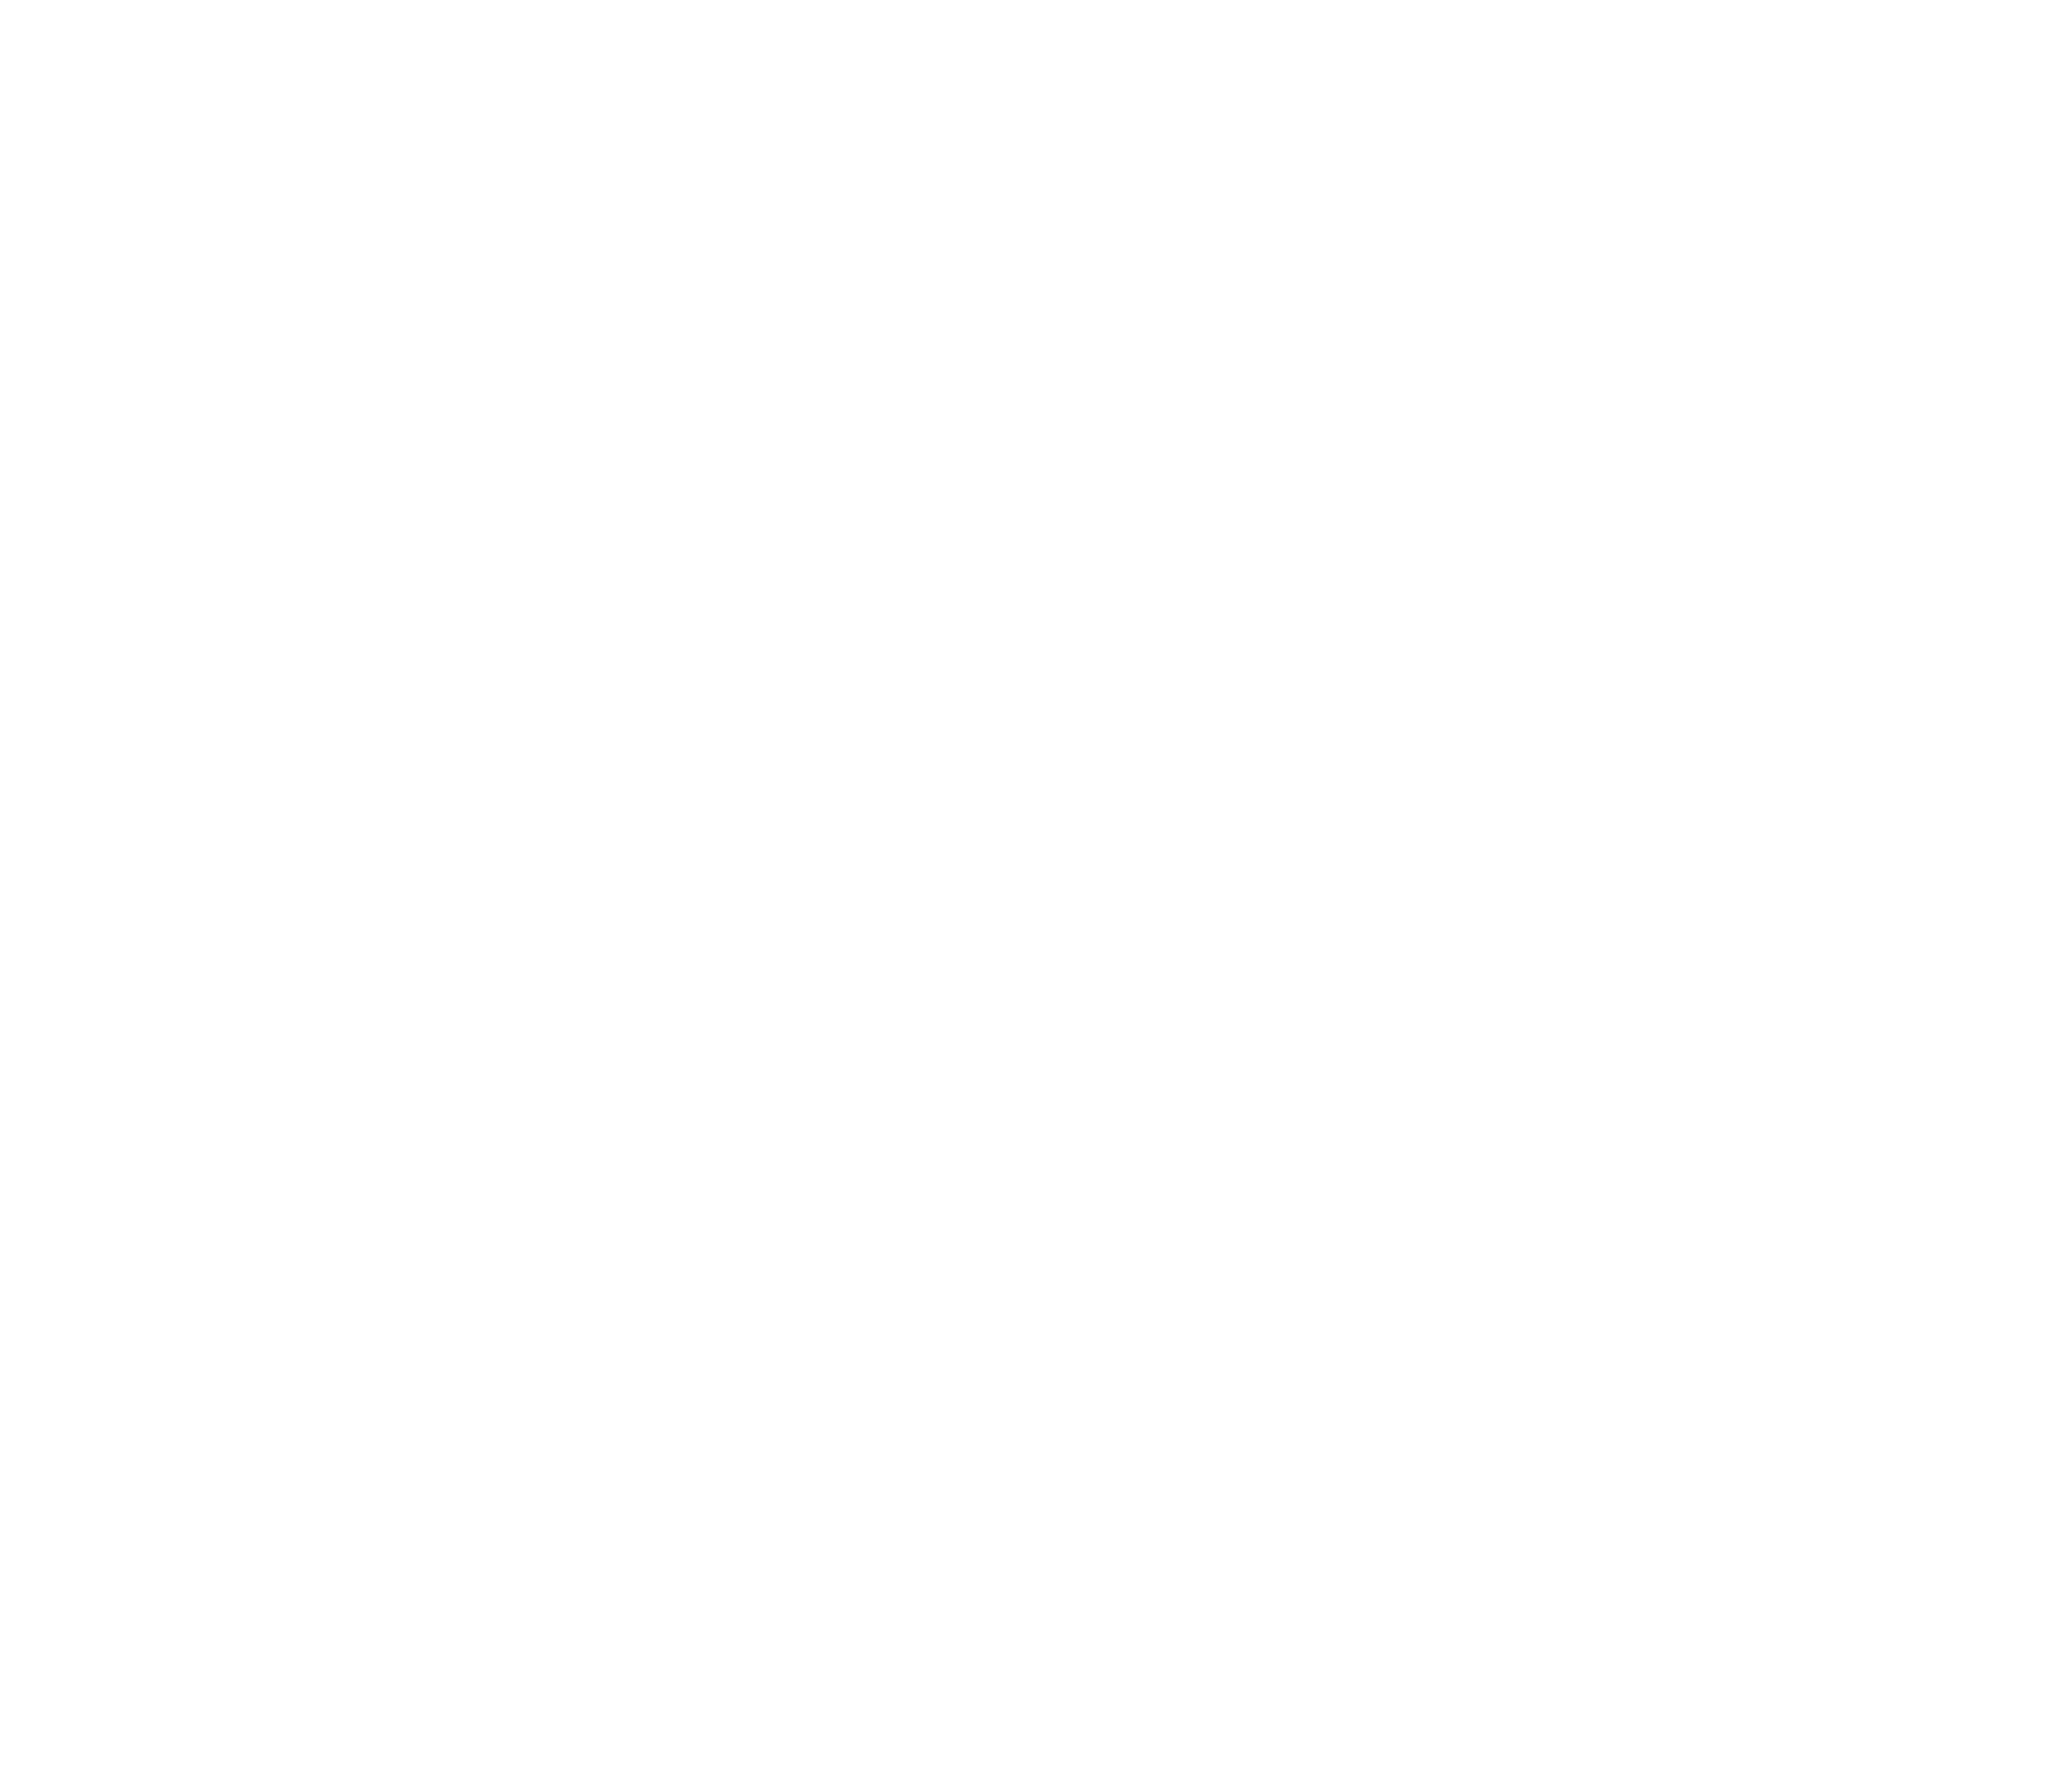 Nueva estructura tarifaria